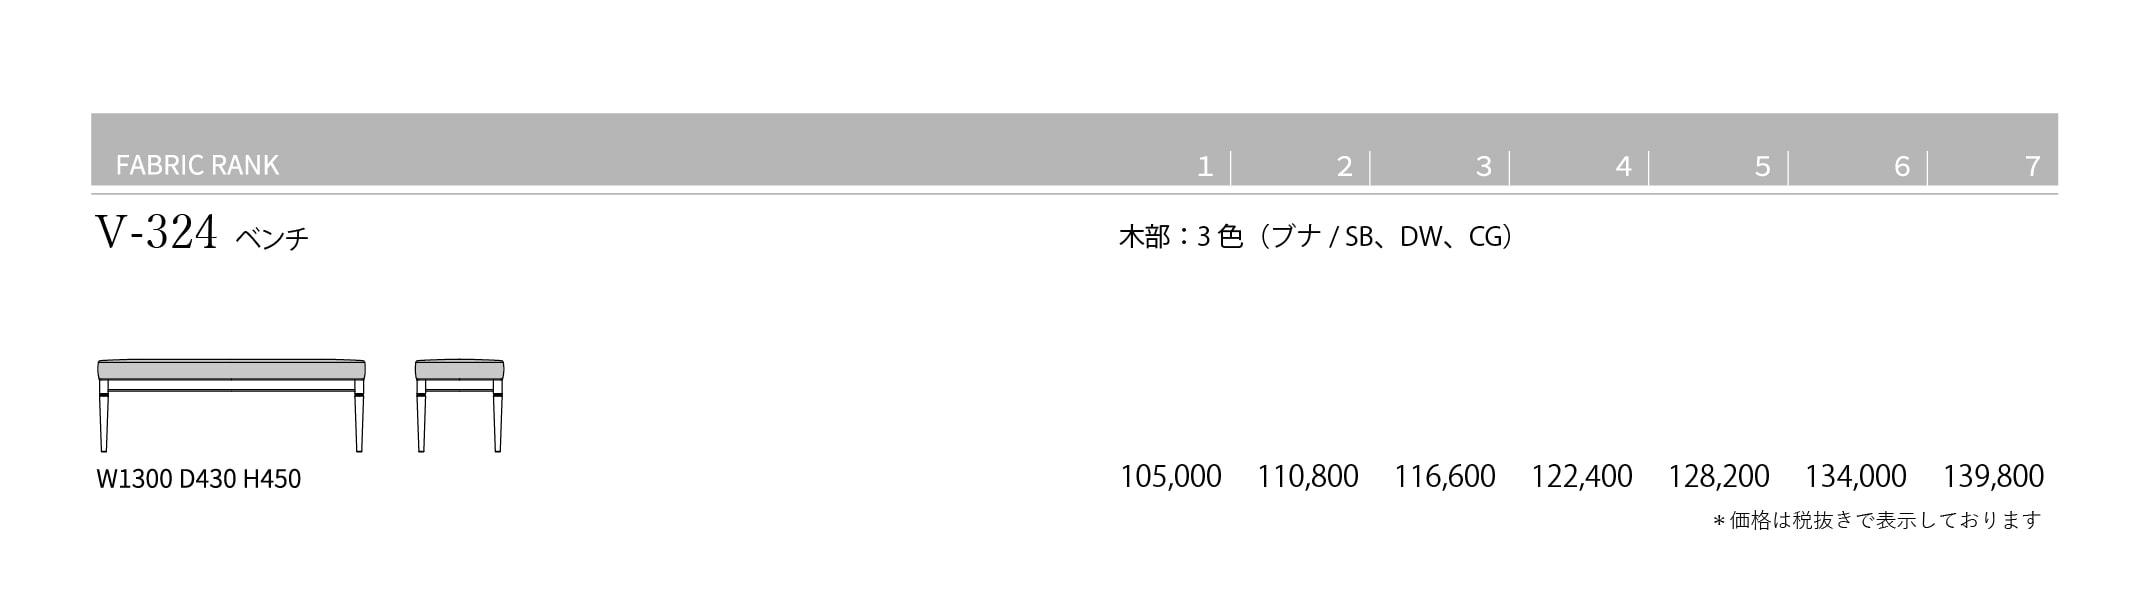 V-324 Price List